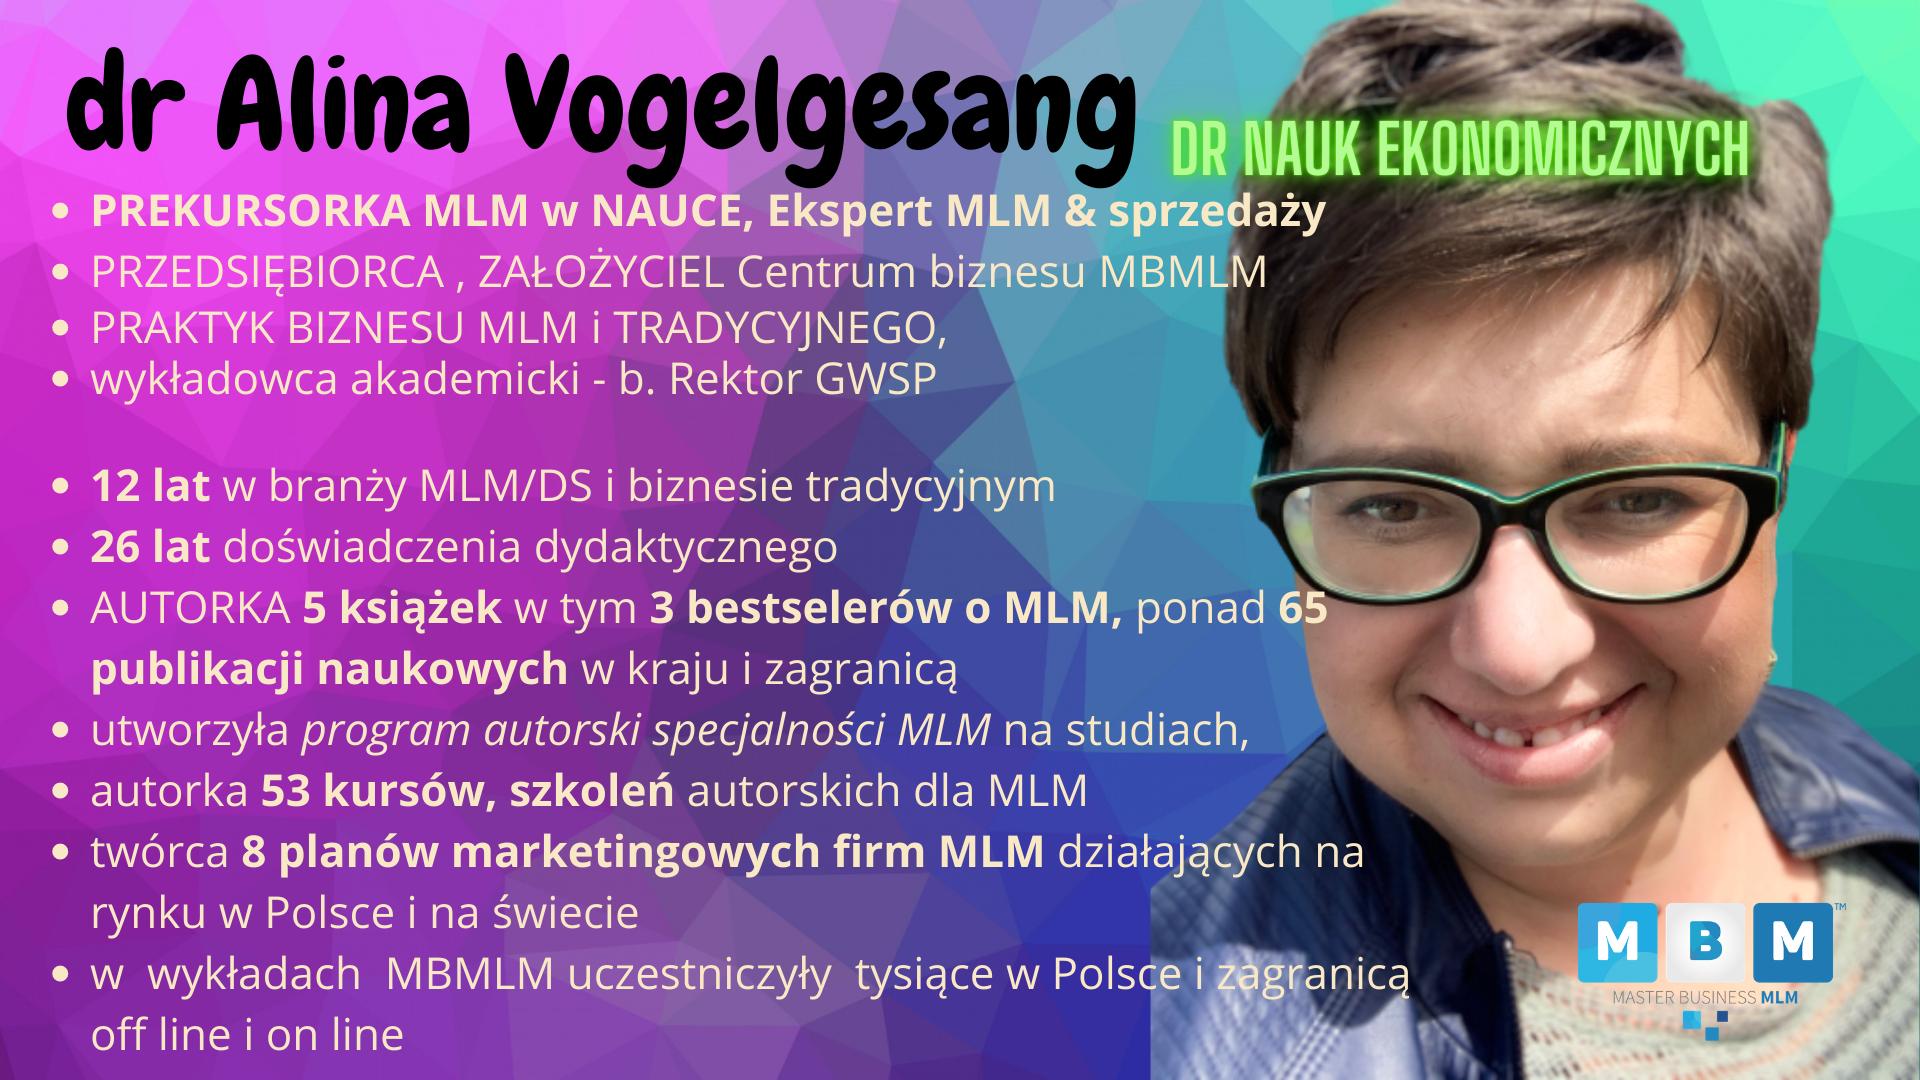 dr Alina Vogelgesang ekspert MLM sprzedaży